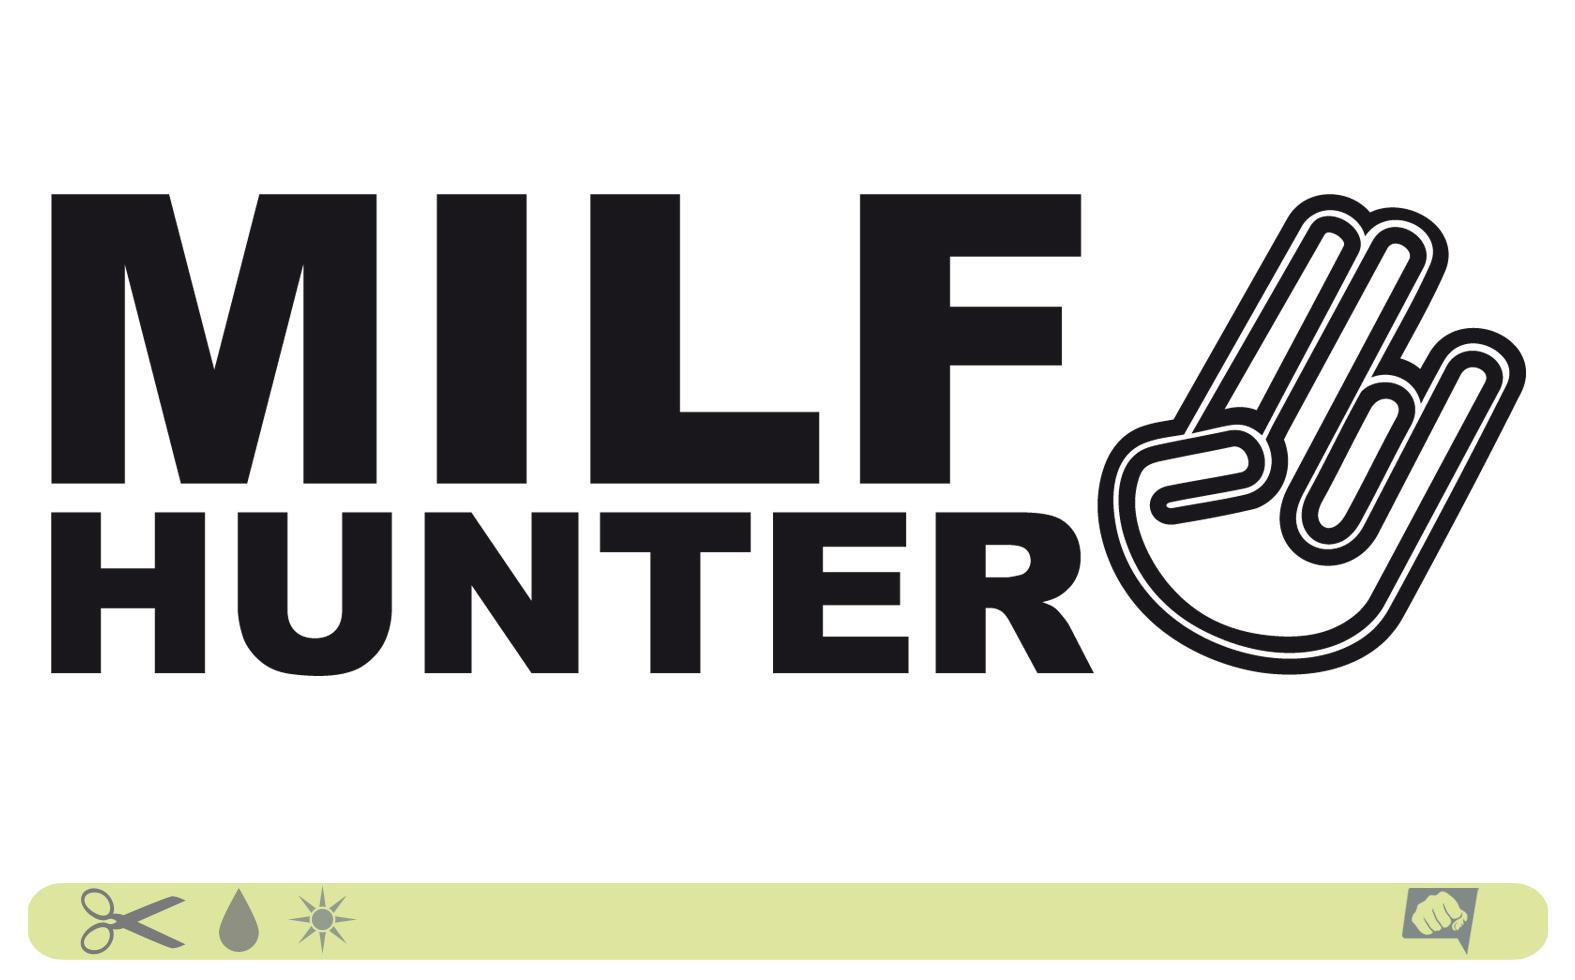 Milf Logo 54